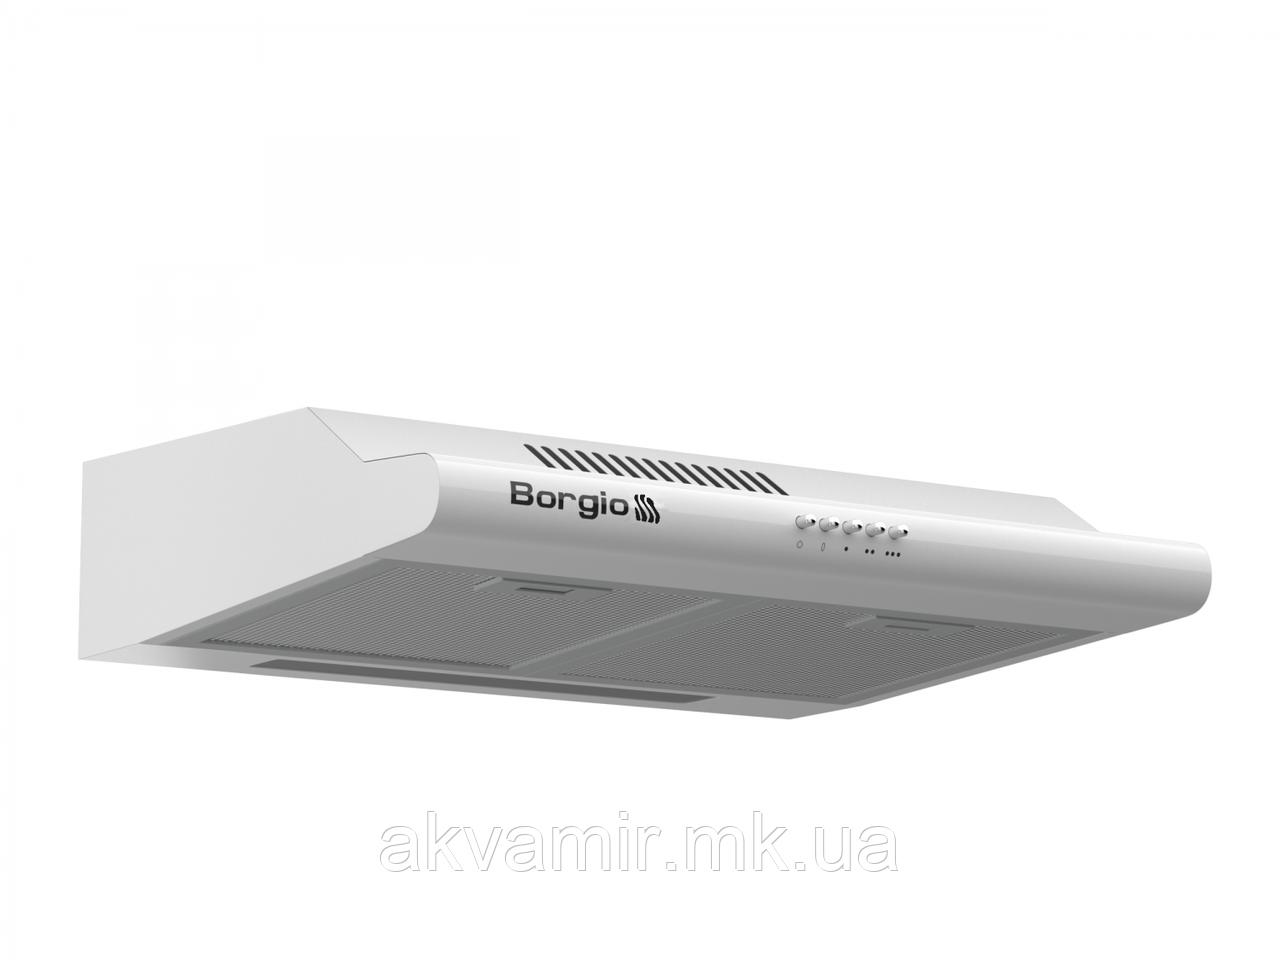 Вытяжка Borgio Gio 50 (белый)